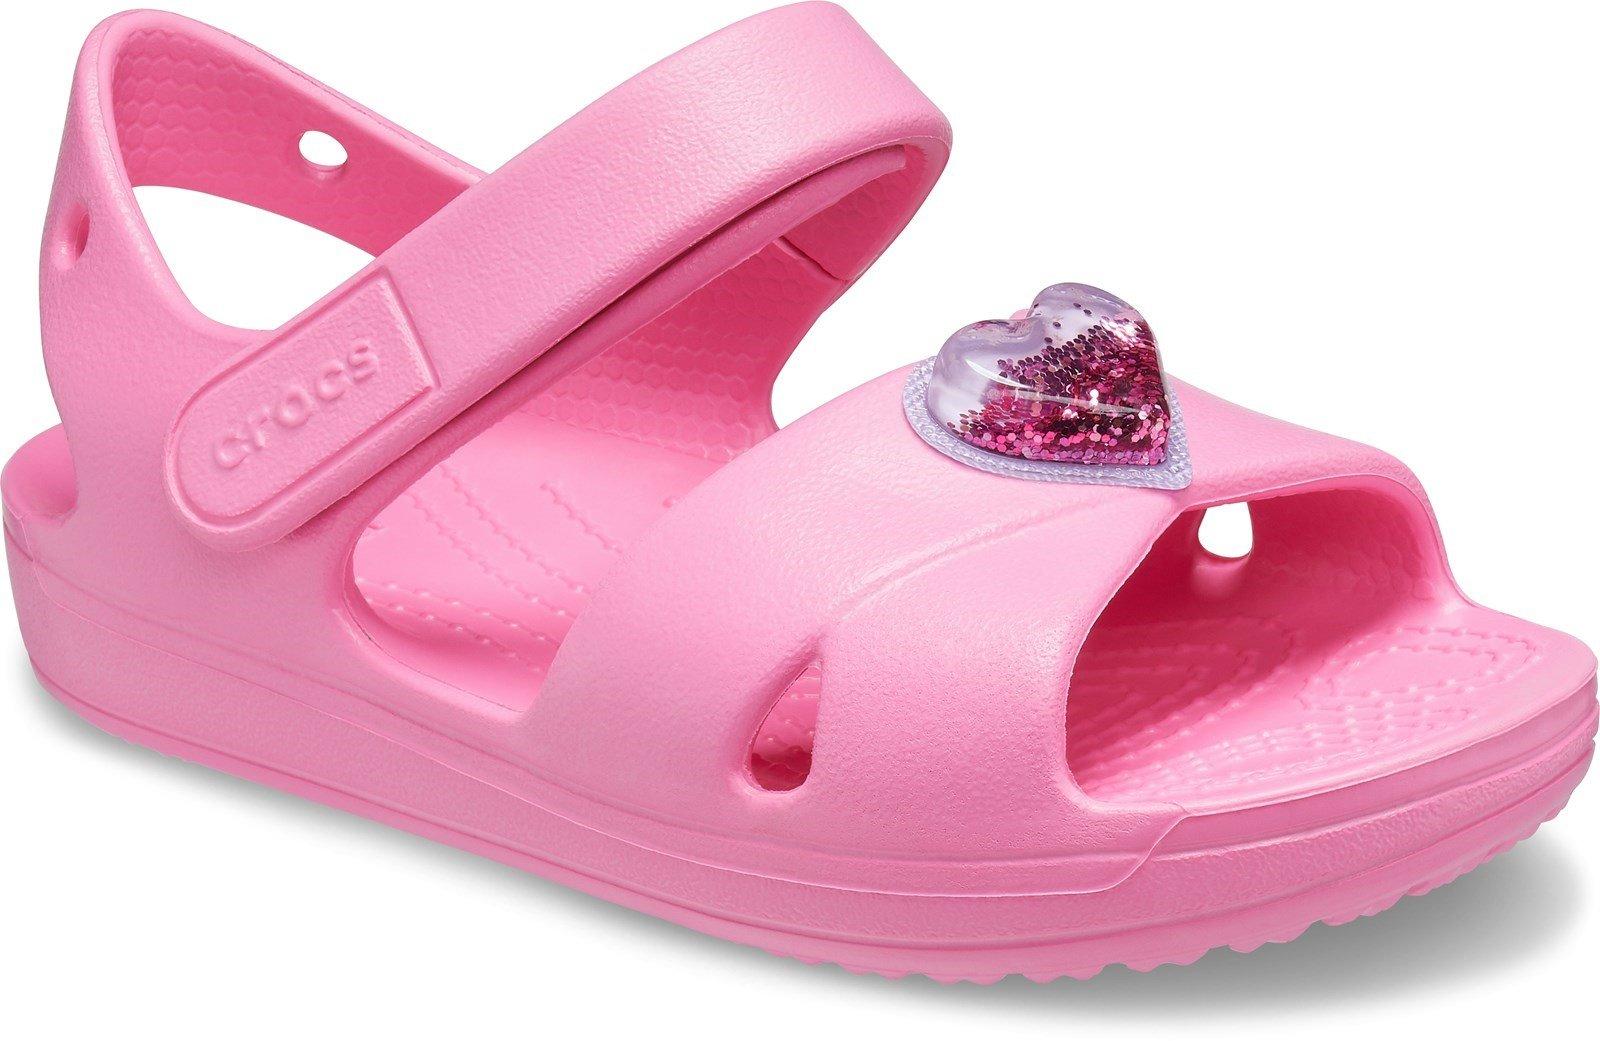 Crocs Kid's Classic Cross Strap Charm Sandal Various Colours 31879 - Pink Lemonade 4